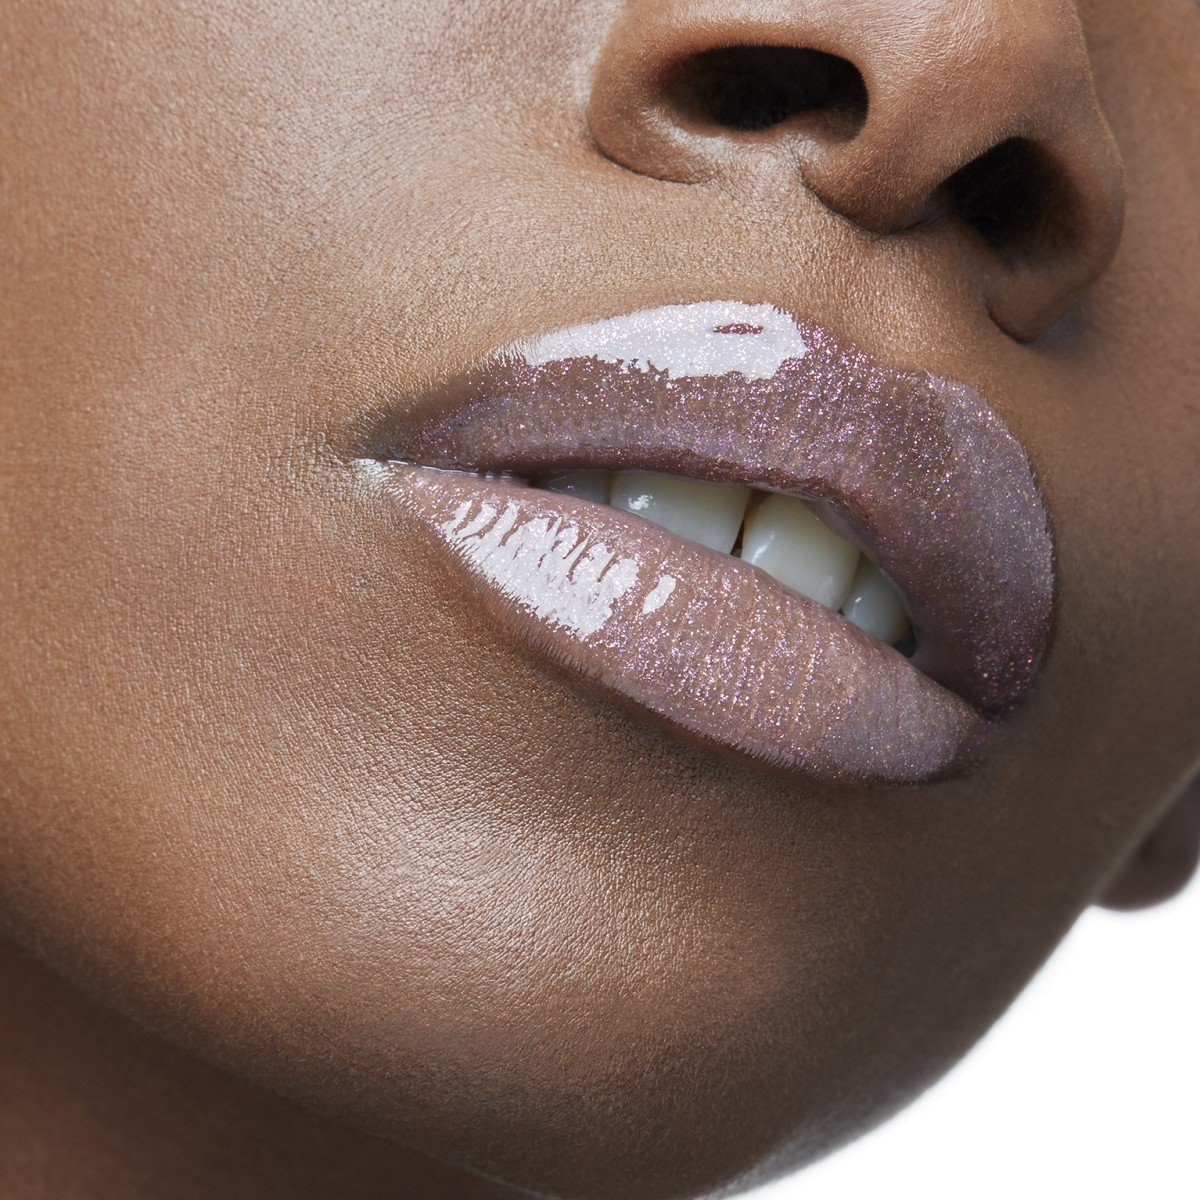 Beauty - Crystal Queen Loubilaque Lip Gloss - Christian Louboutin